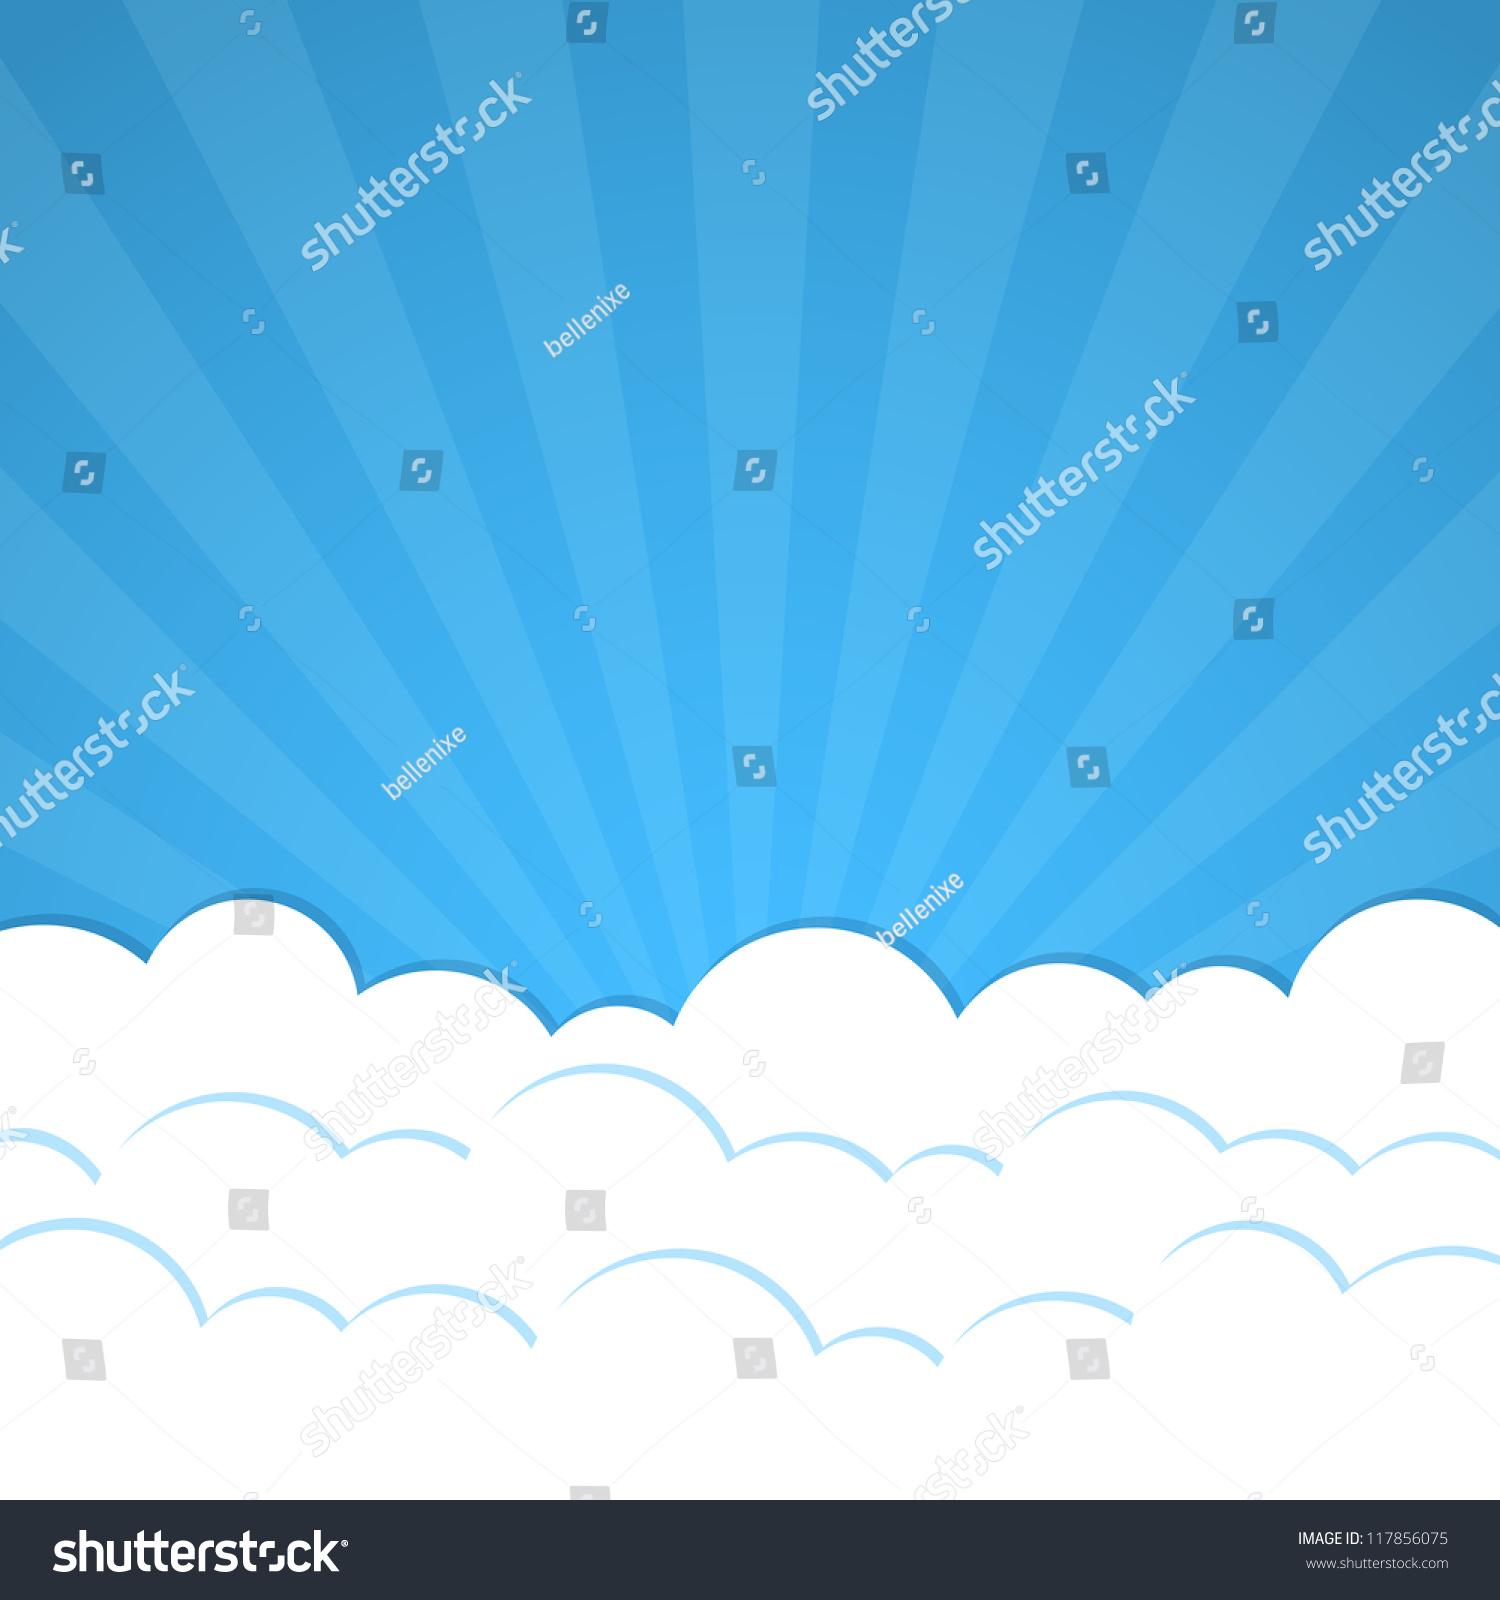 cloud clipart background - photo #47